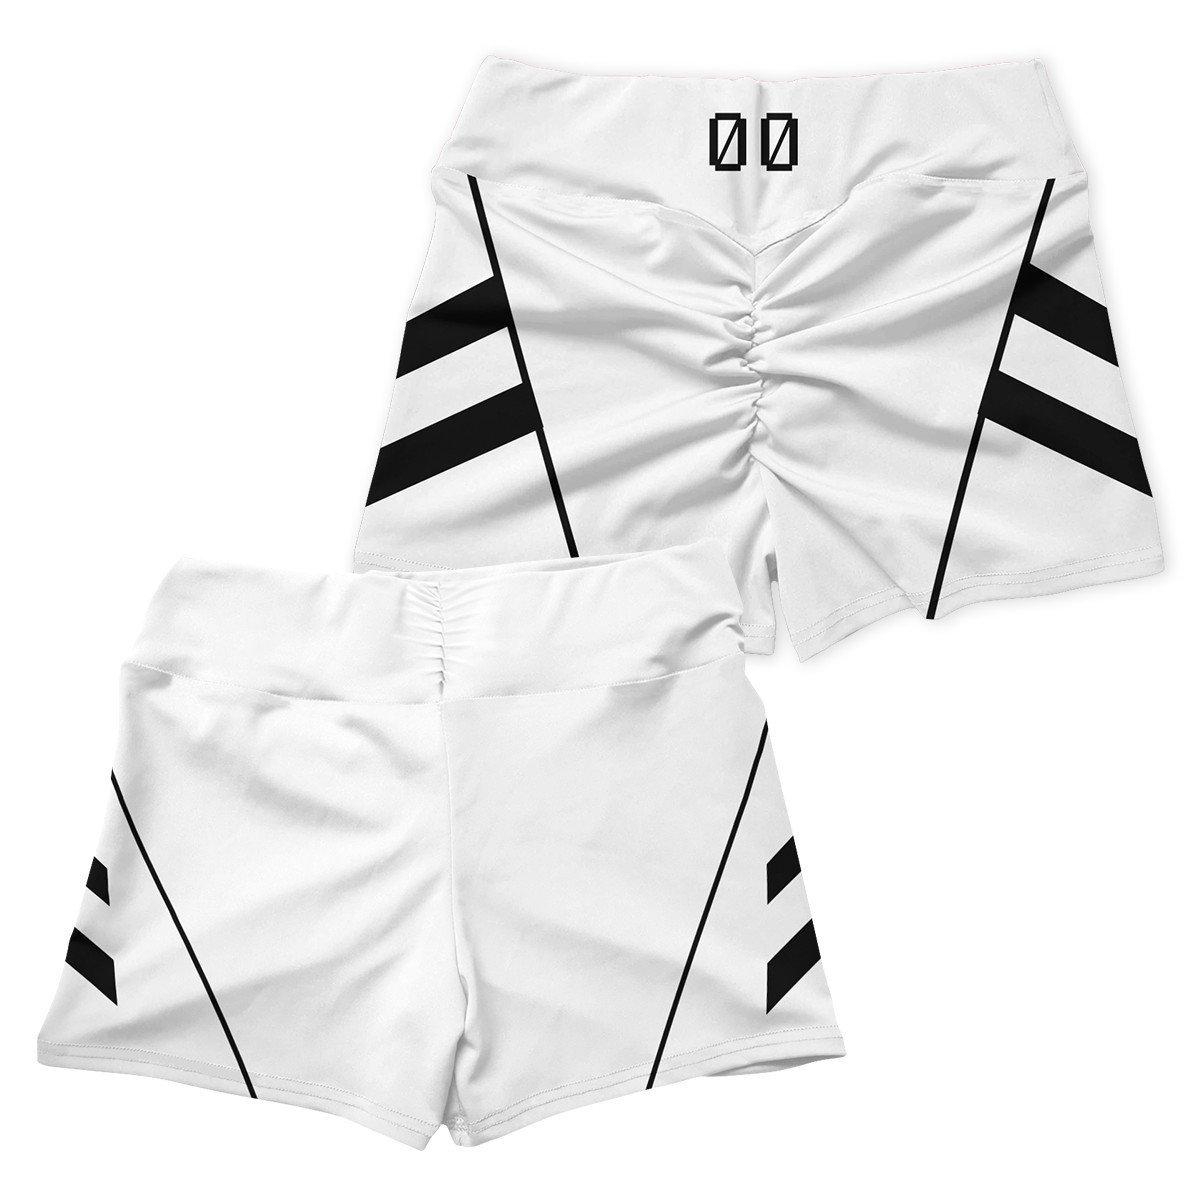 neon genesis rei active wear set 370938 - Anime Swimsuits